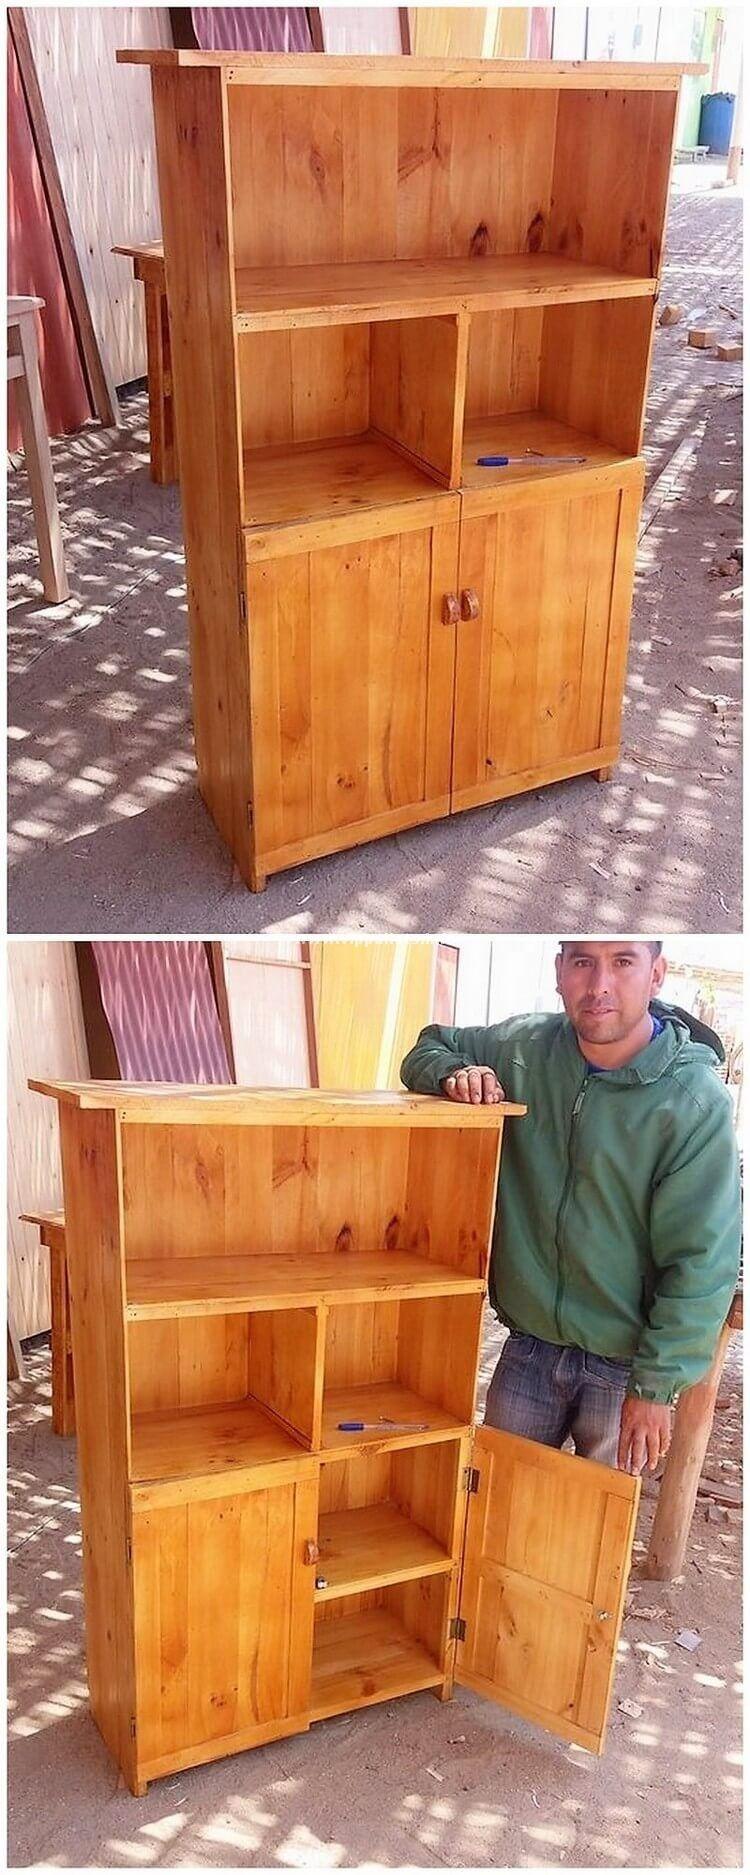 Five Star Diy Wooden Pallets Hutch Ideas | Pallet ...